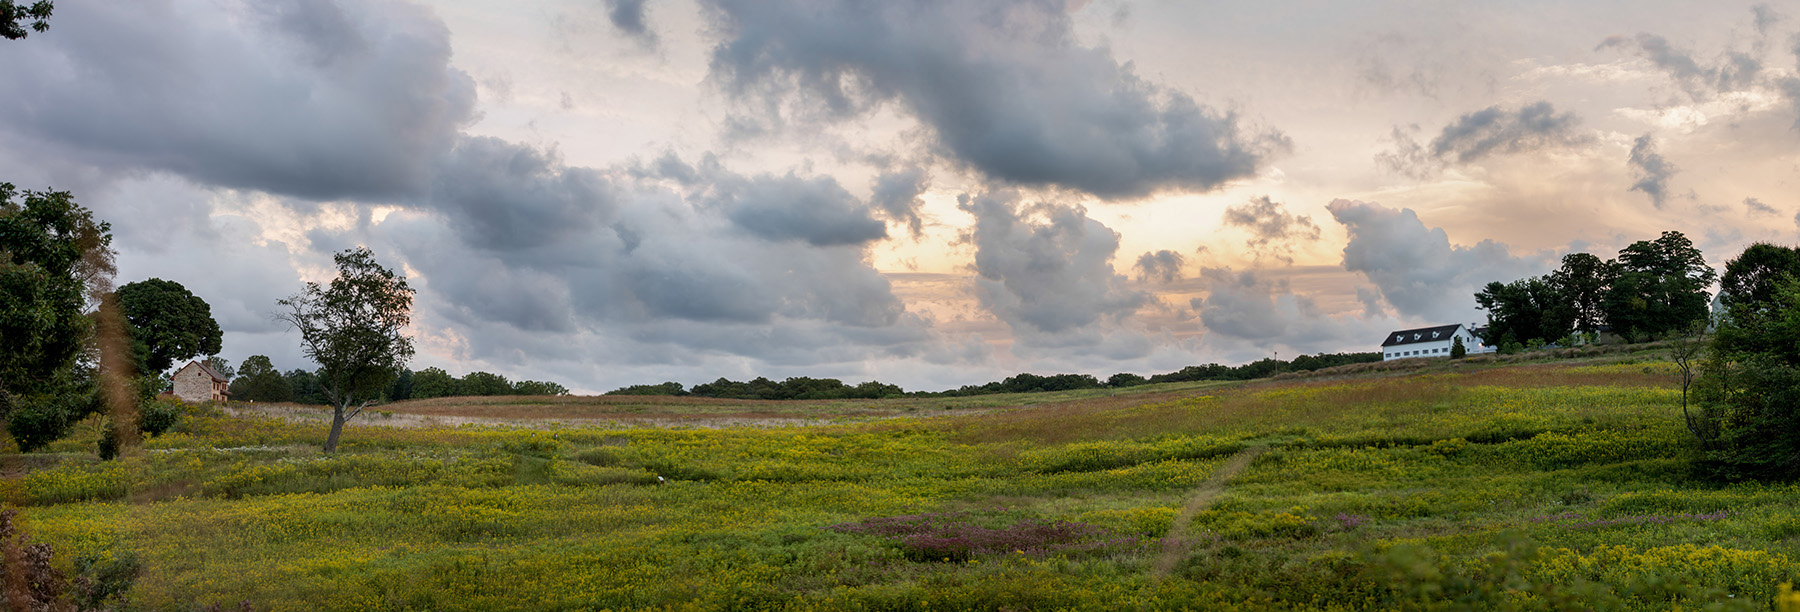 152837_Longwood_Meadow_-_Sunset_Davis_Harold_Hank_Longwood_Volunteer_Photographer_small.jpg